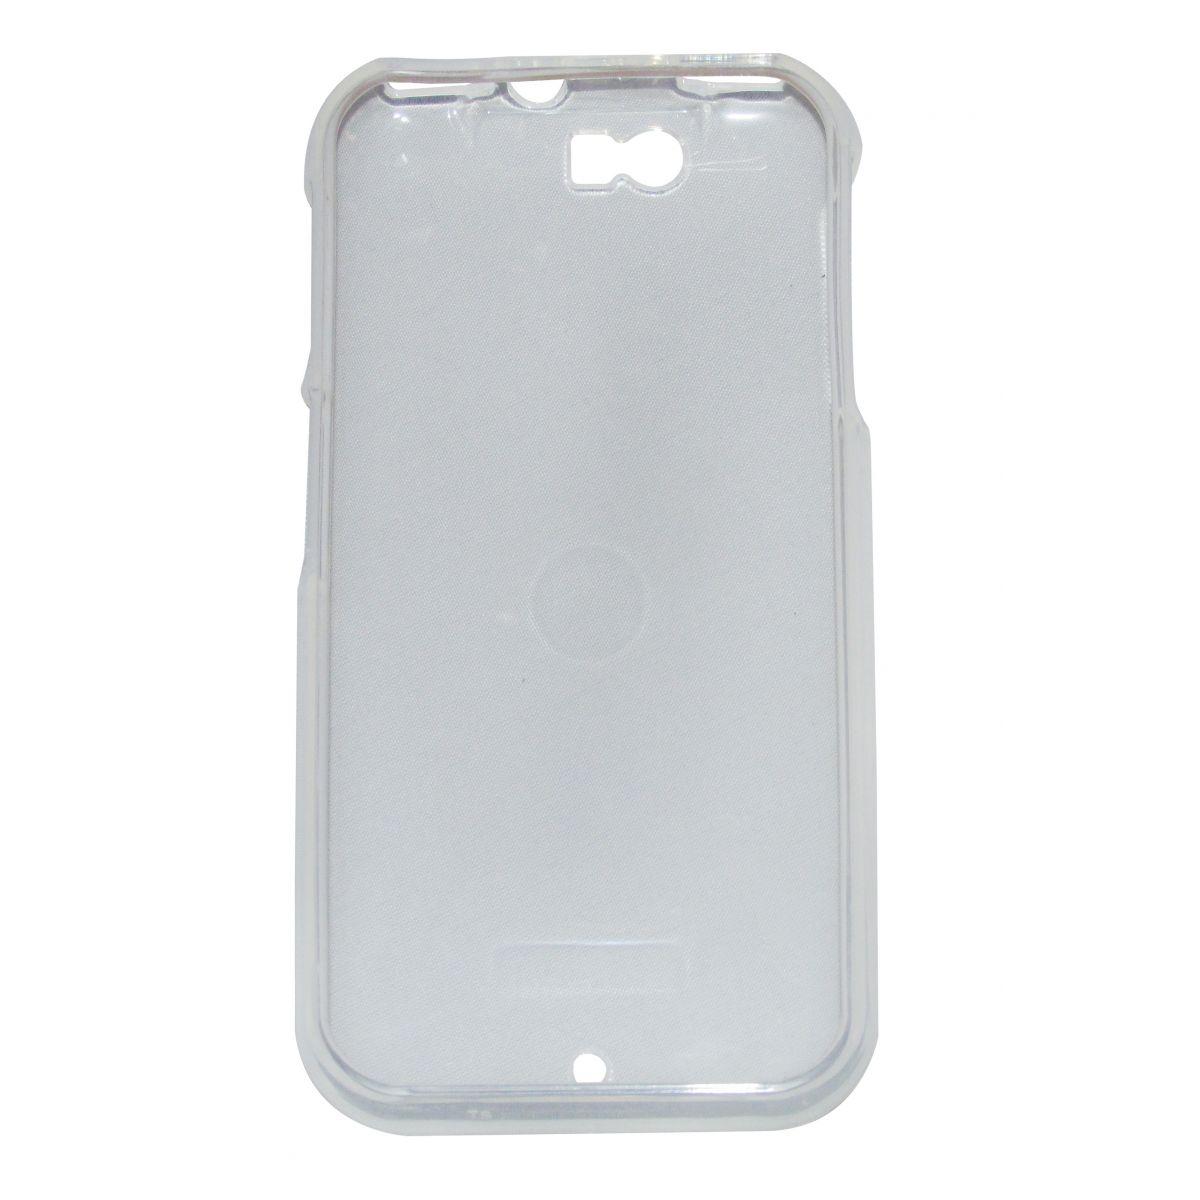 Capa TPU Transparente Motorola Moto Iron Rock XT626